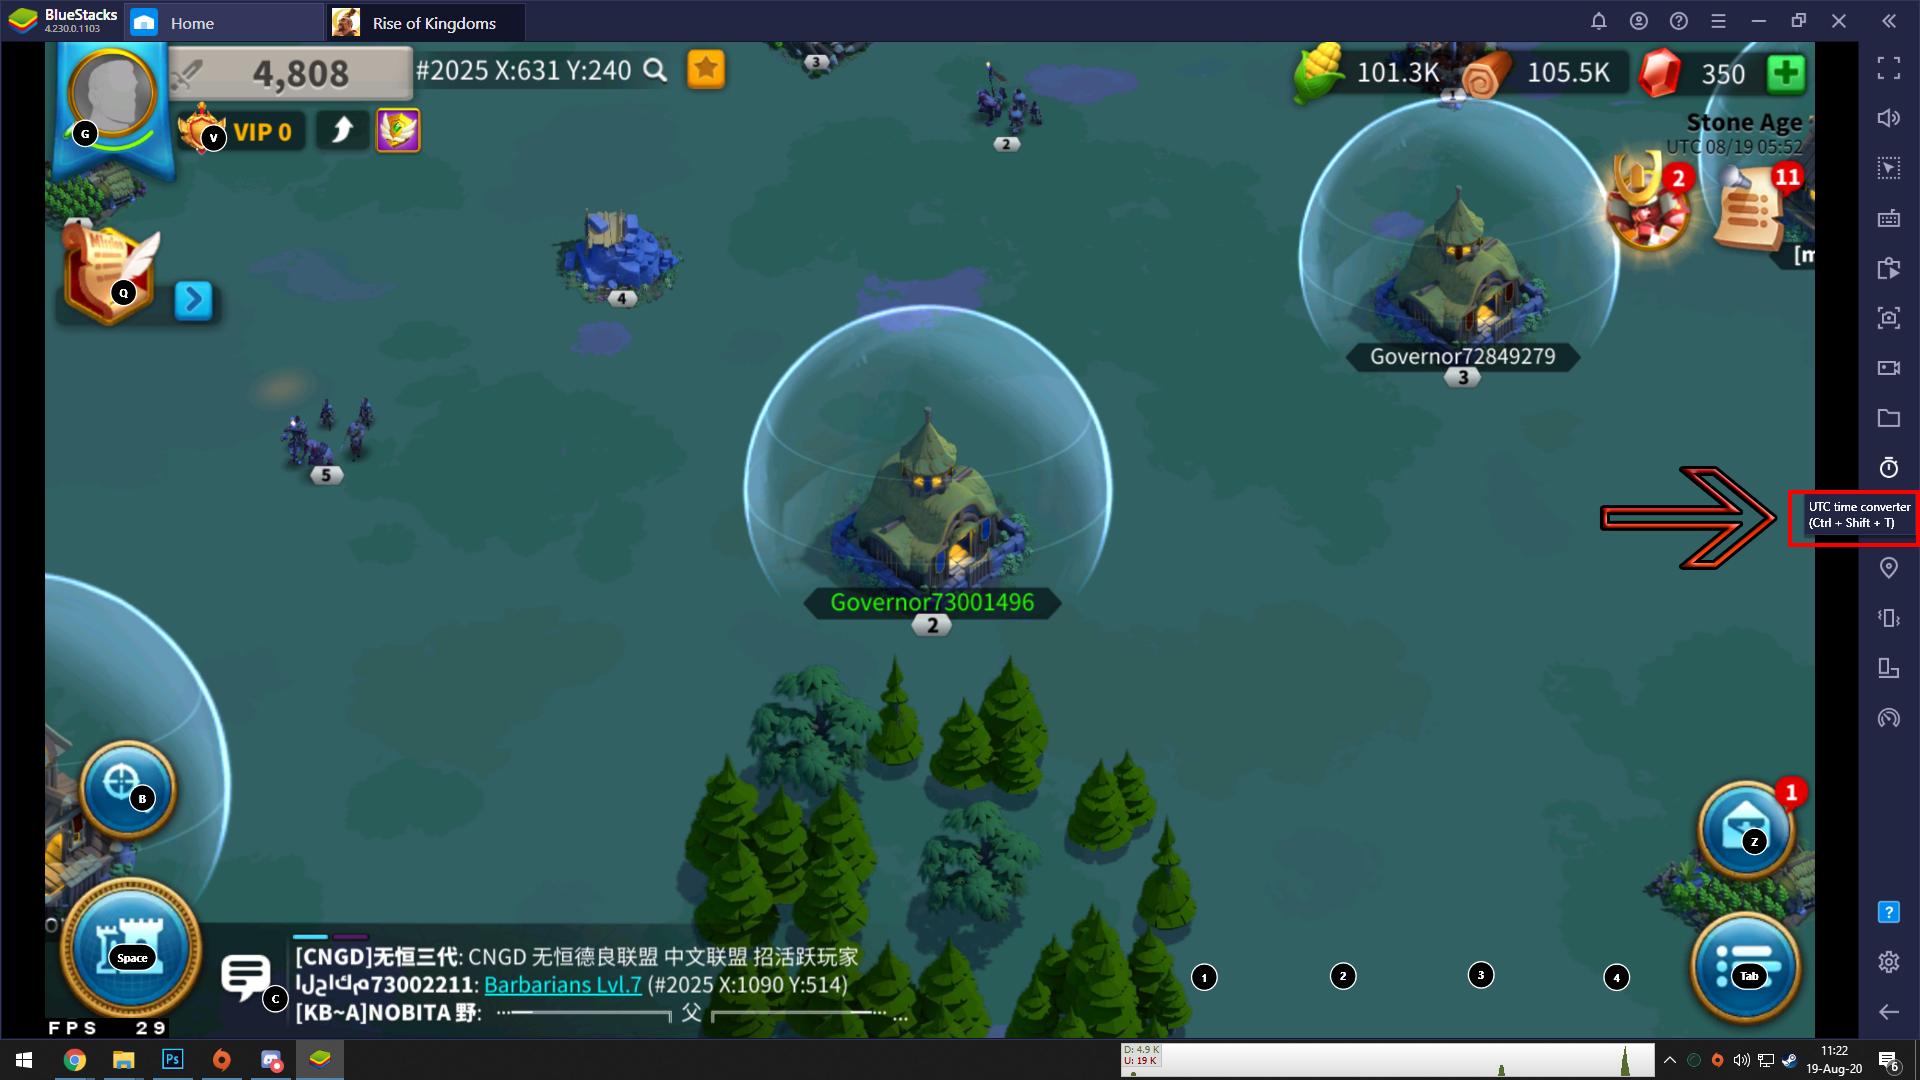 BlueStacks的新增功能「協調世界時轉換器(UTC Converter)」: 手動將遊戲內的活動之協調世界時轉換成當地的時區